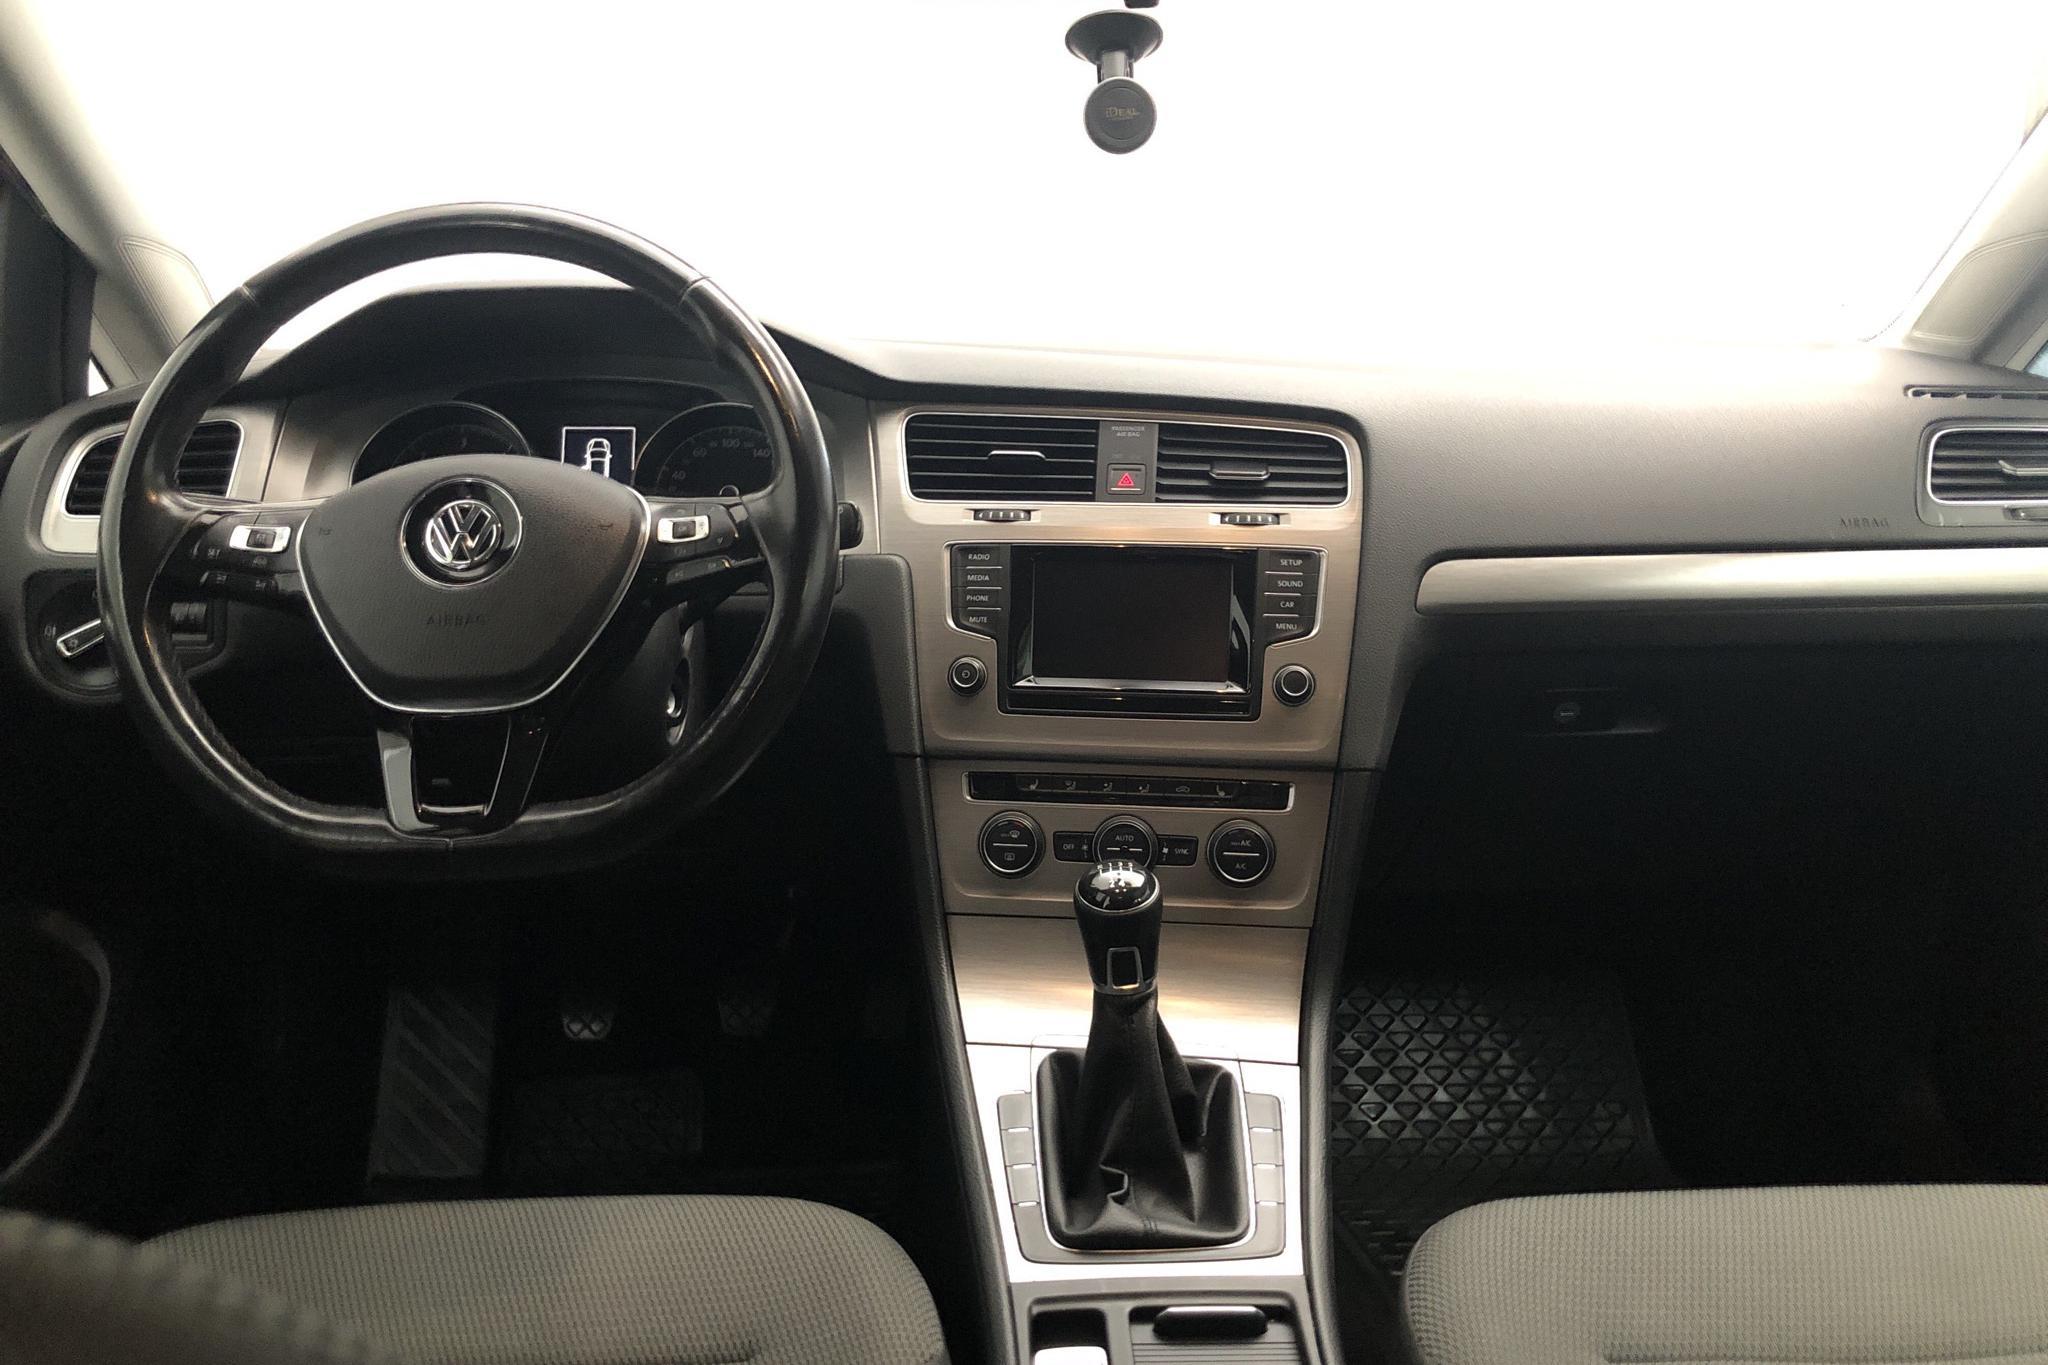 VW Golf VII 1.6 TDI BlueMotion Technology Sportscombi (105hk) - 160 980 km - Manual - red - 2014